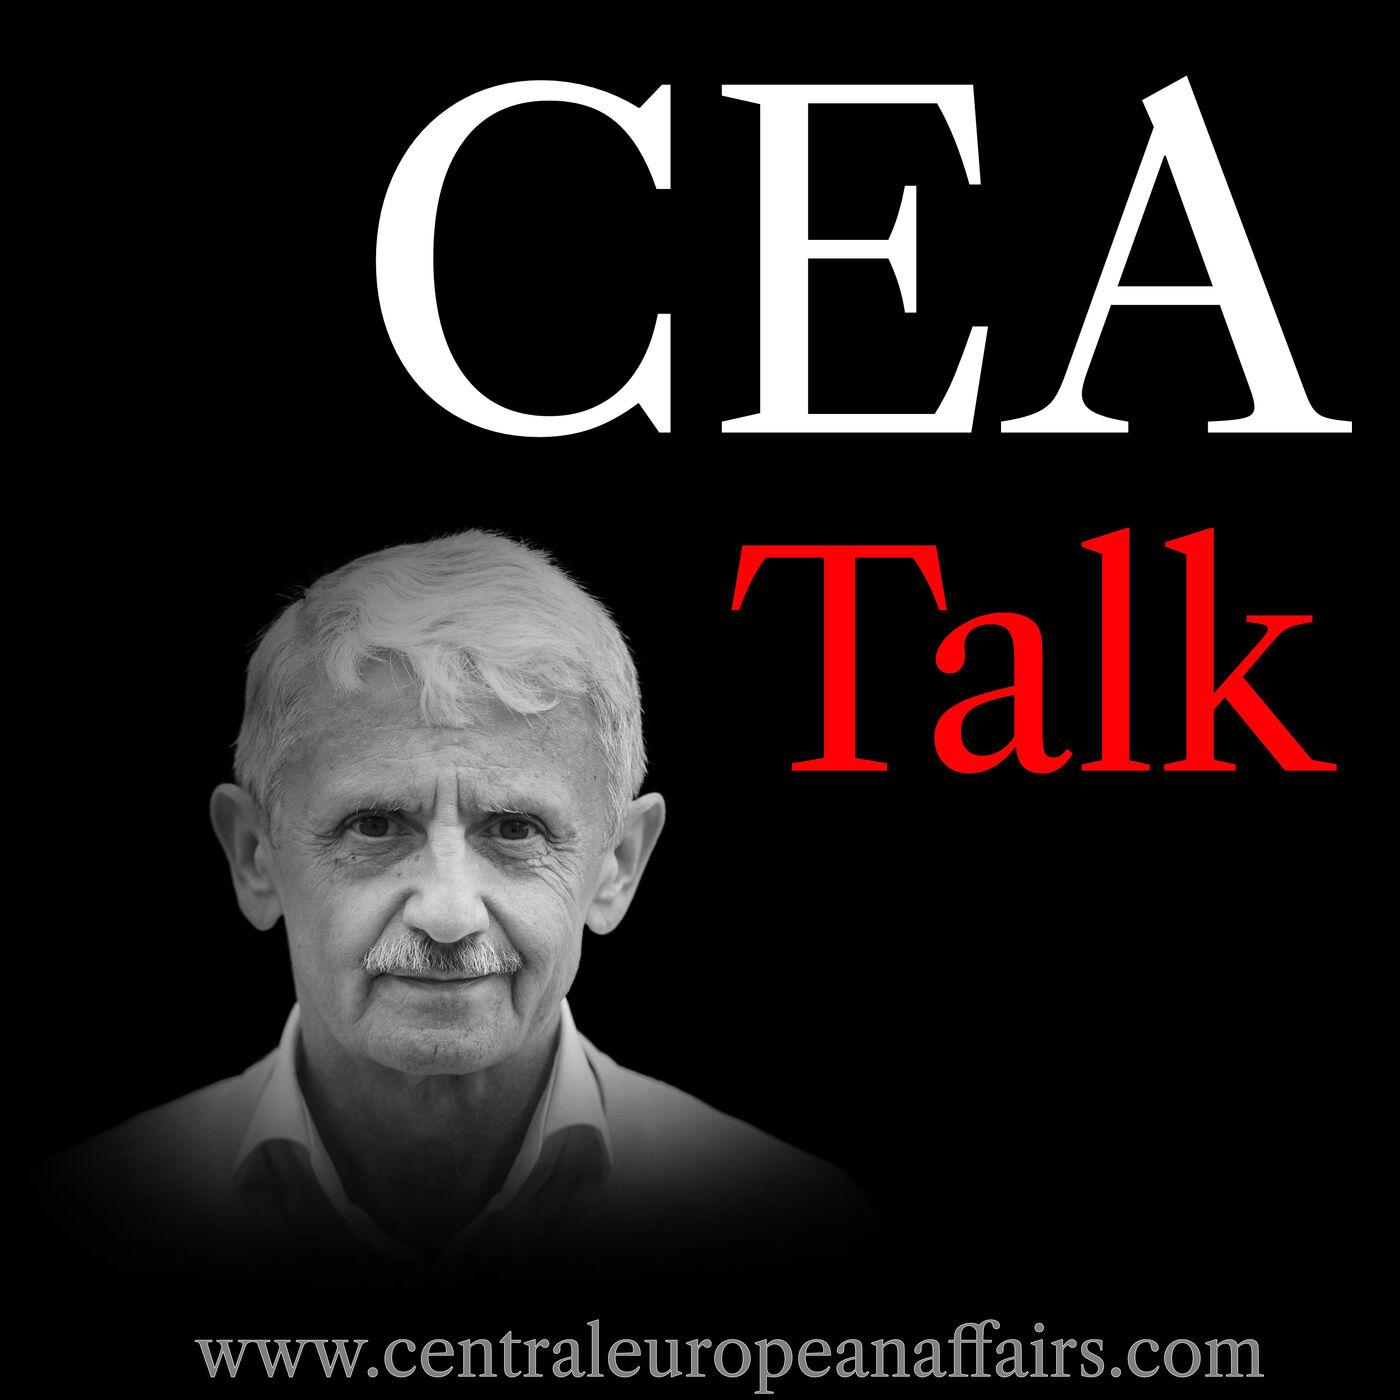 Dzurinda: The EU needs to become a global power